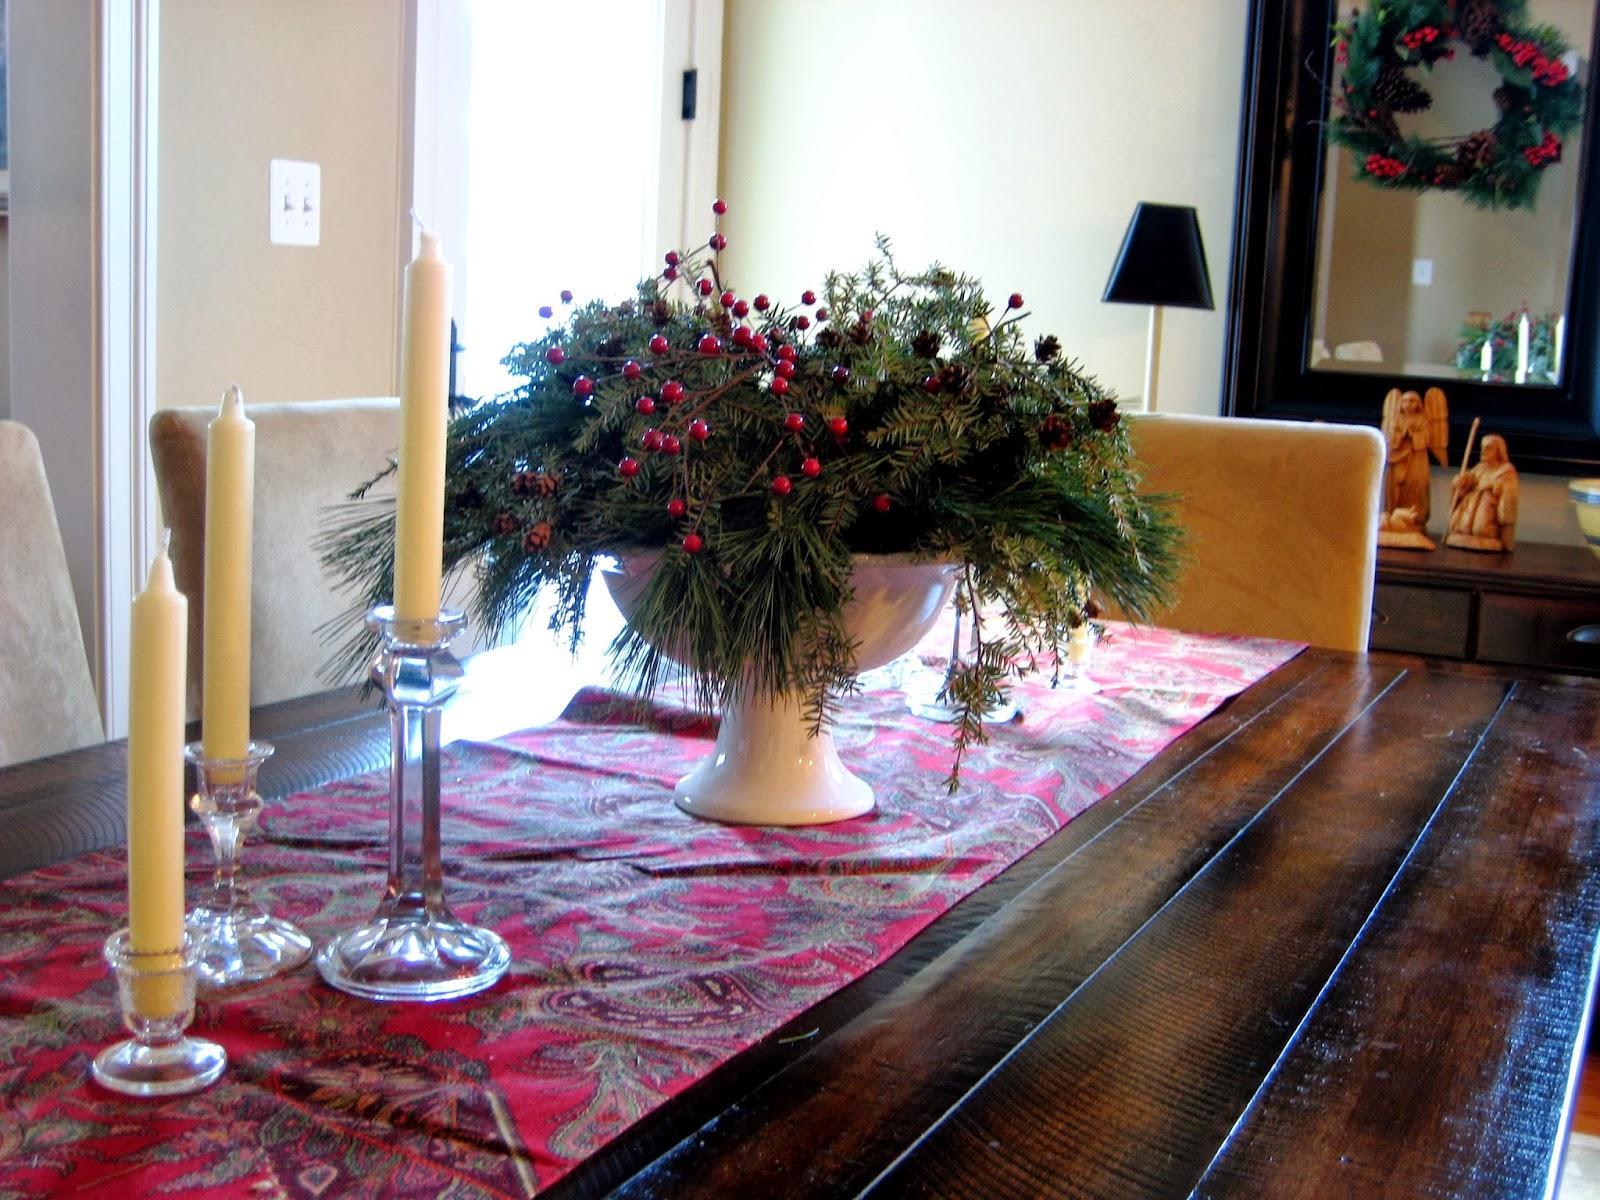 Salt marsh cottage natural christmas centerpieces tutorial